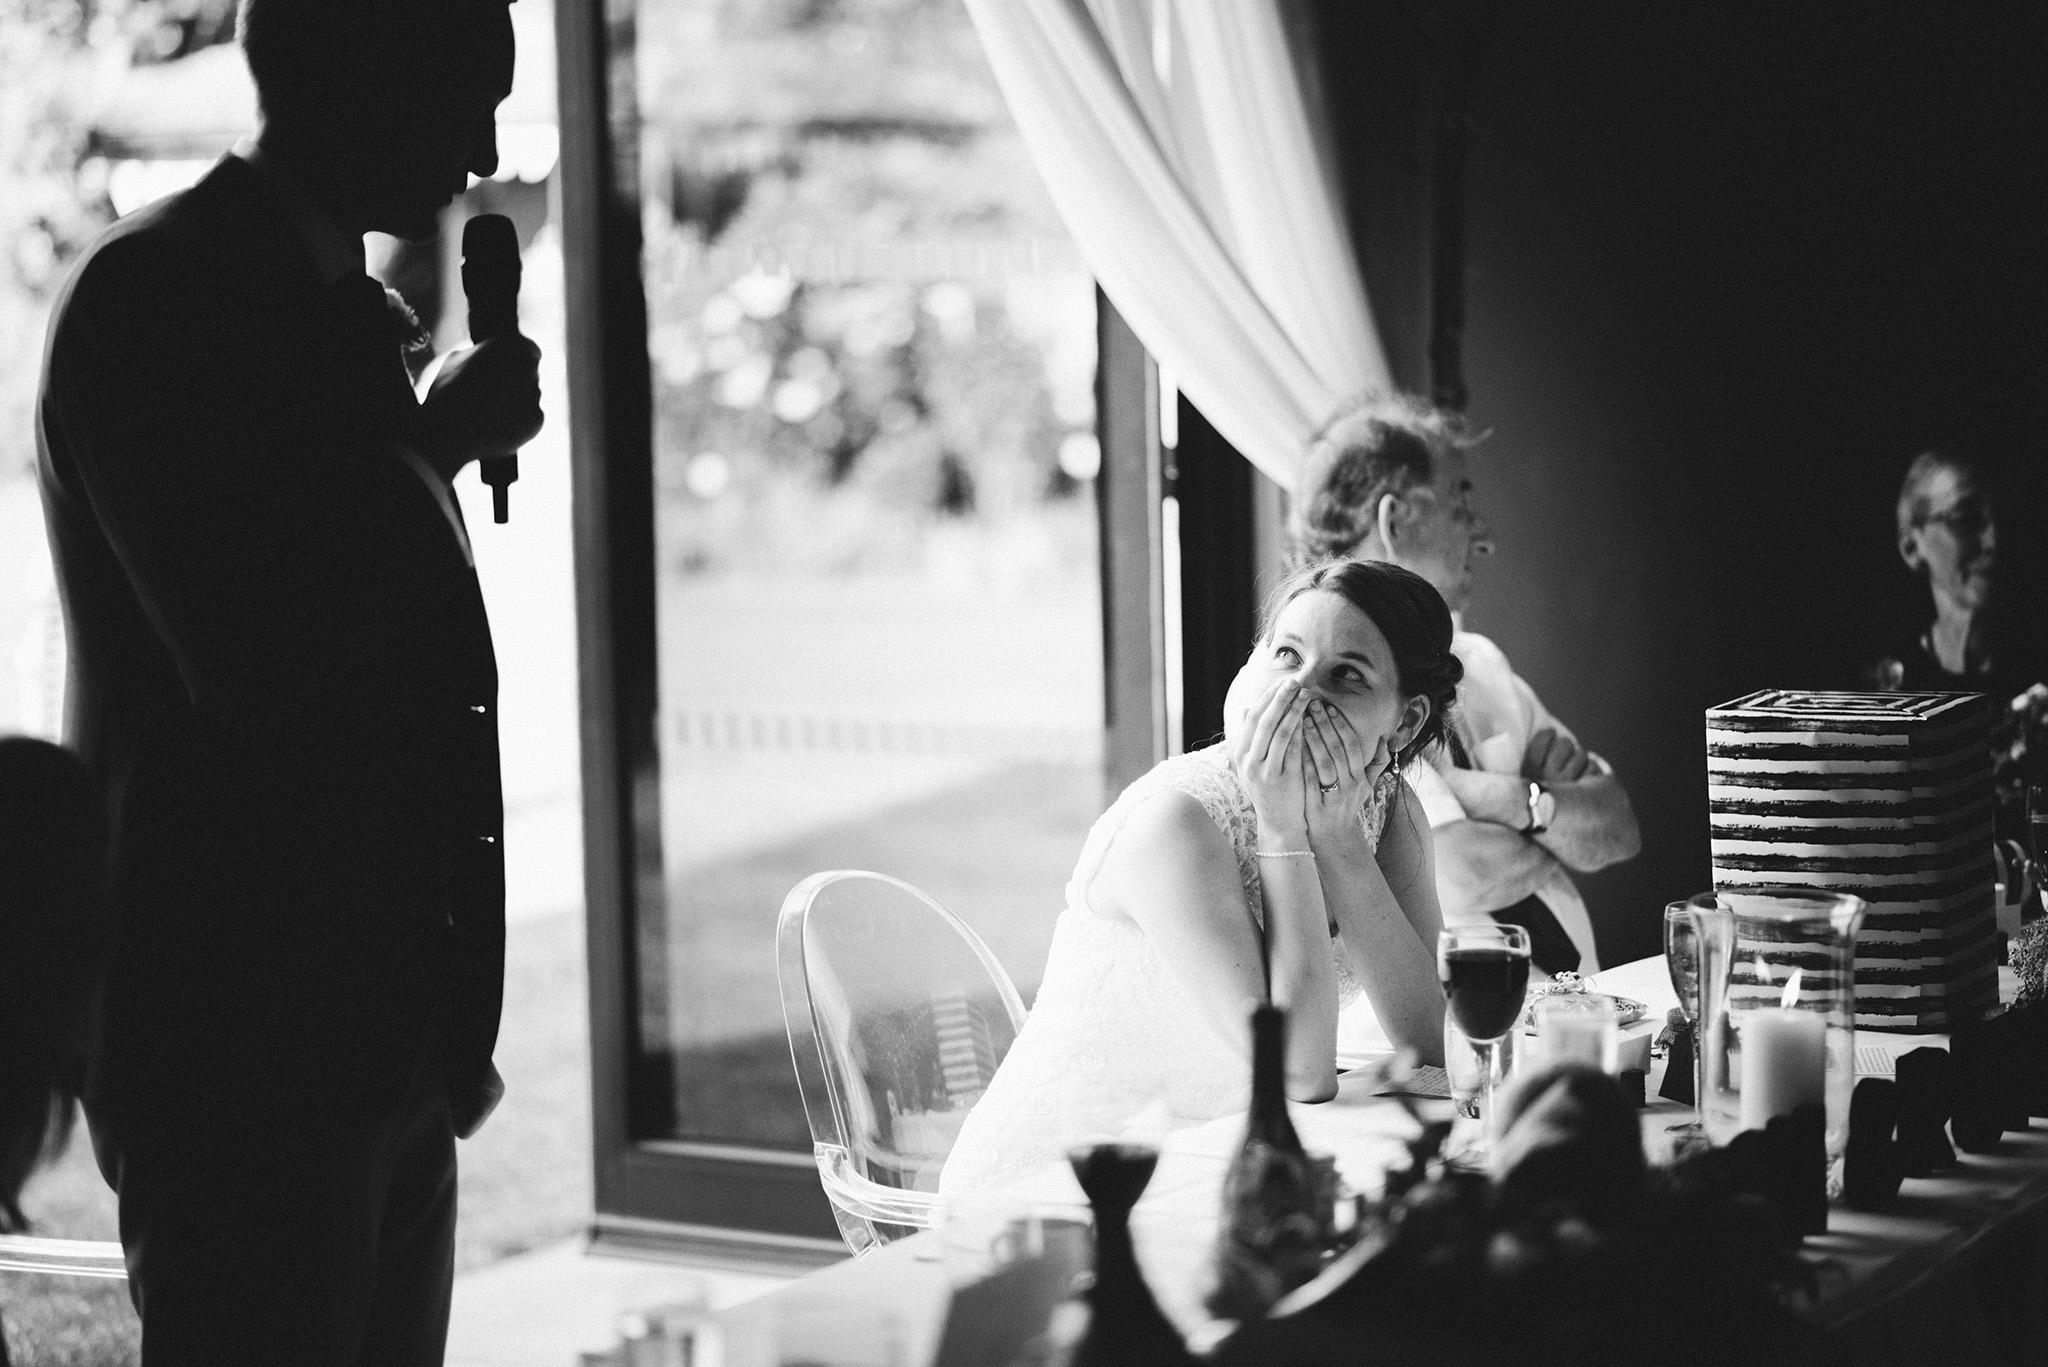 scott-stockwell-photography-wedding-25.jpg